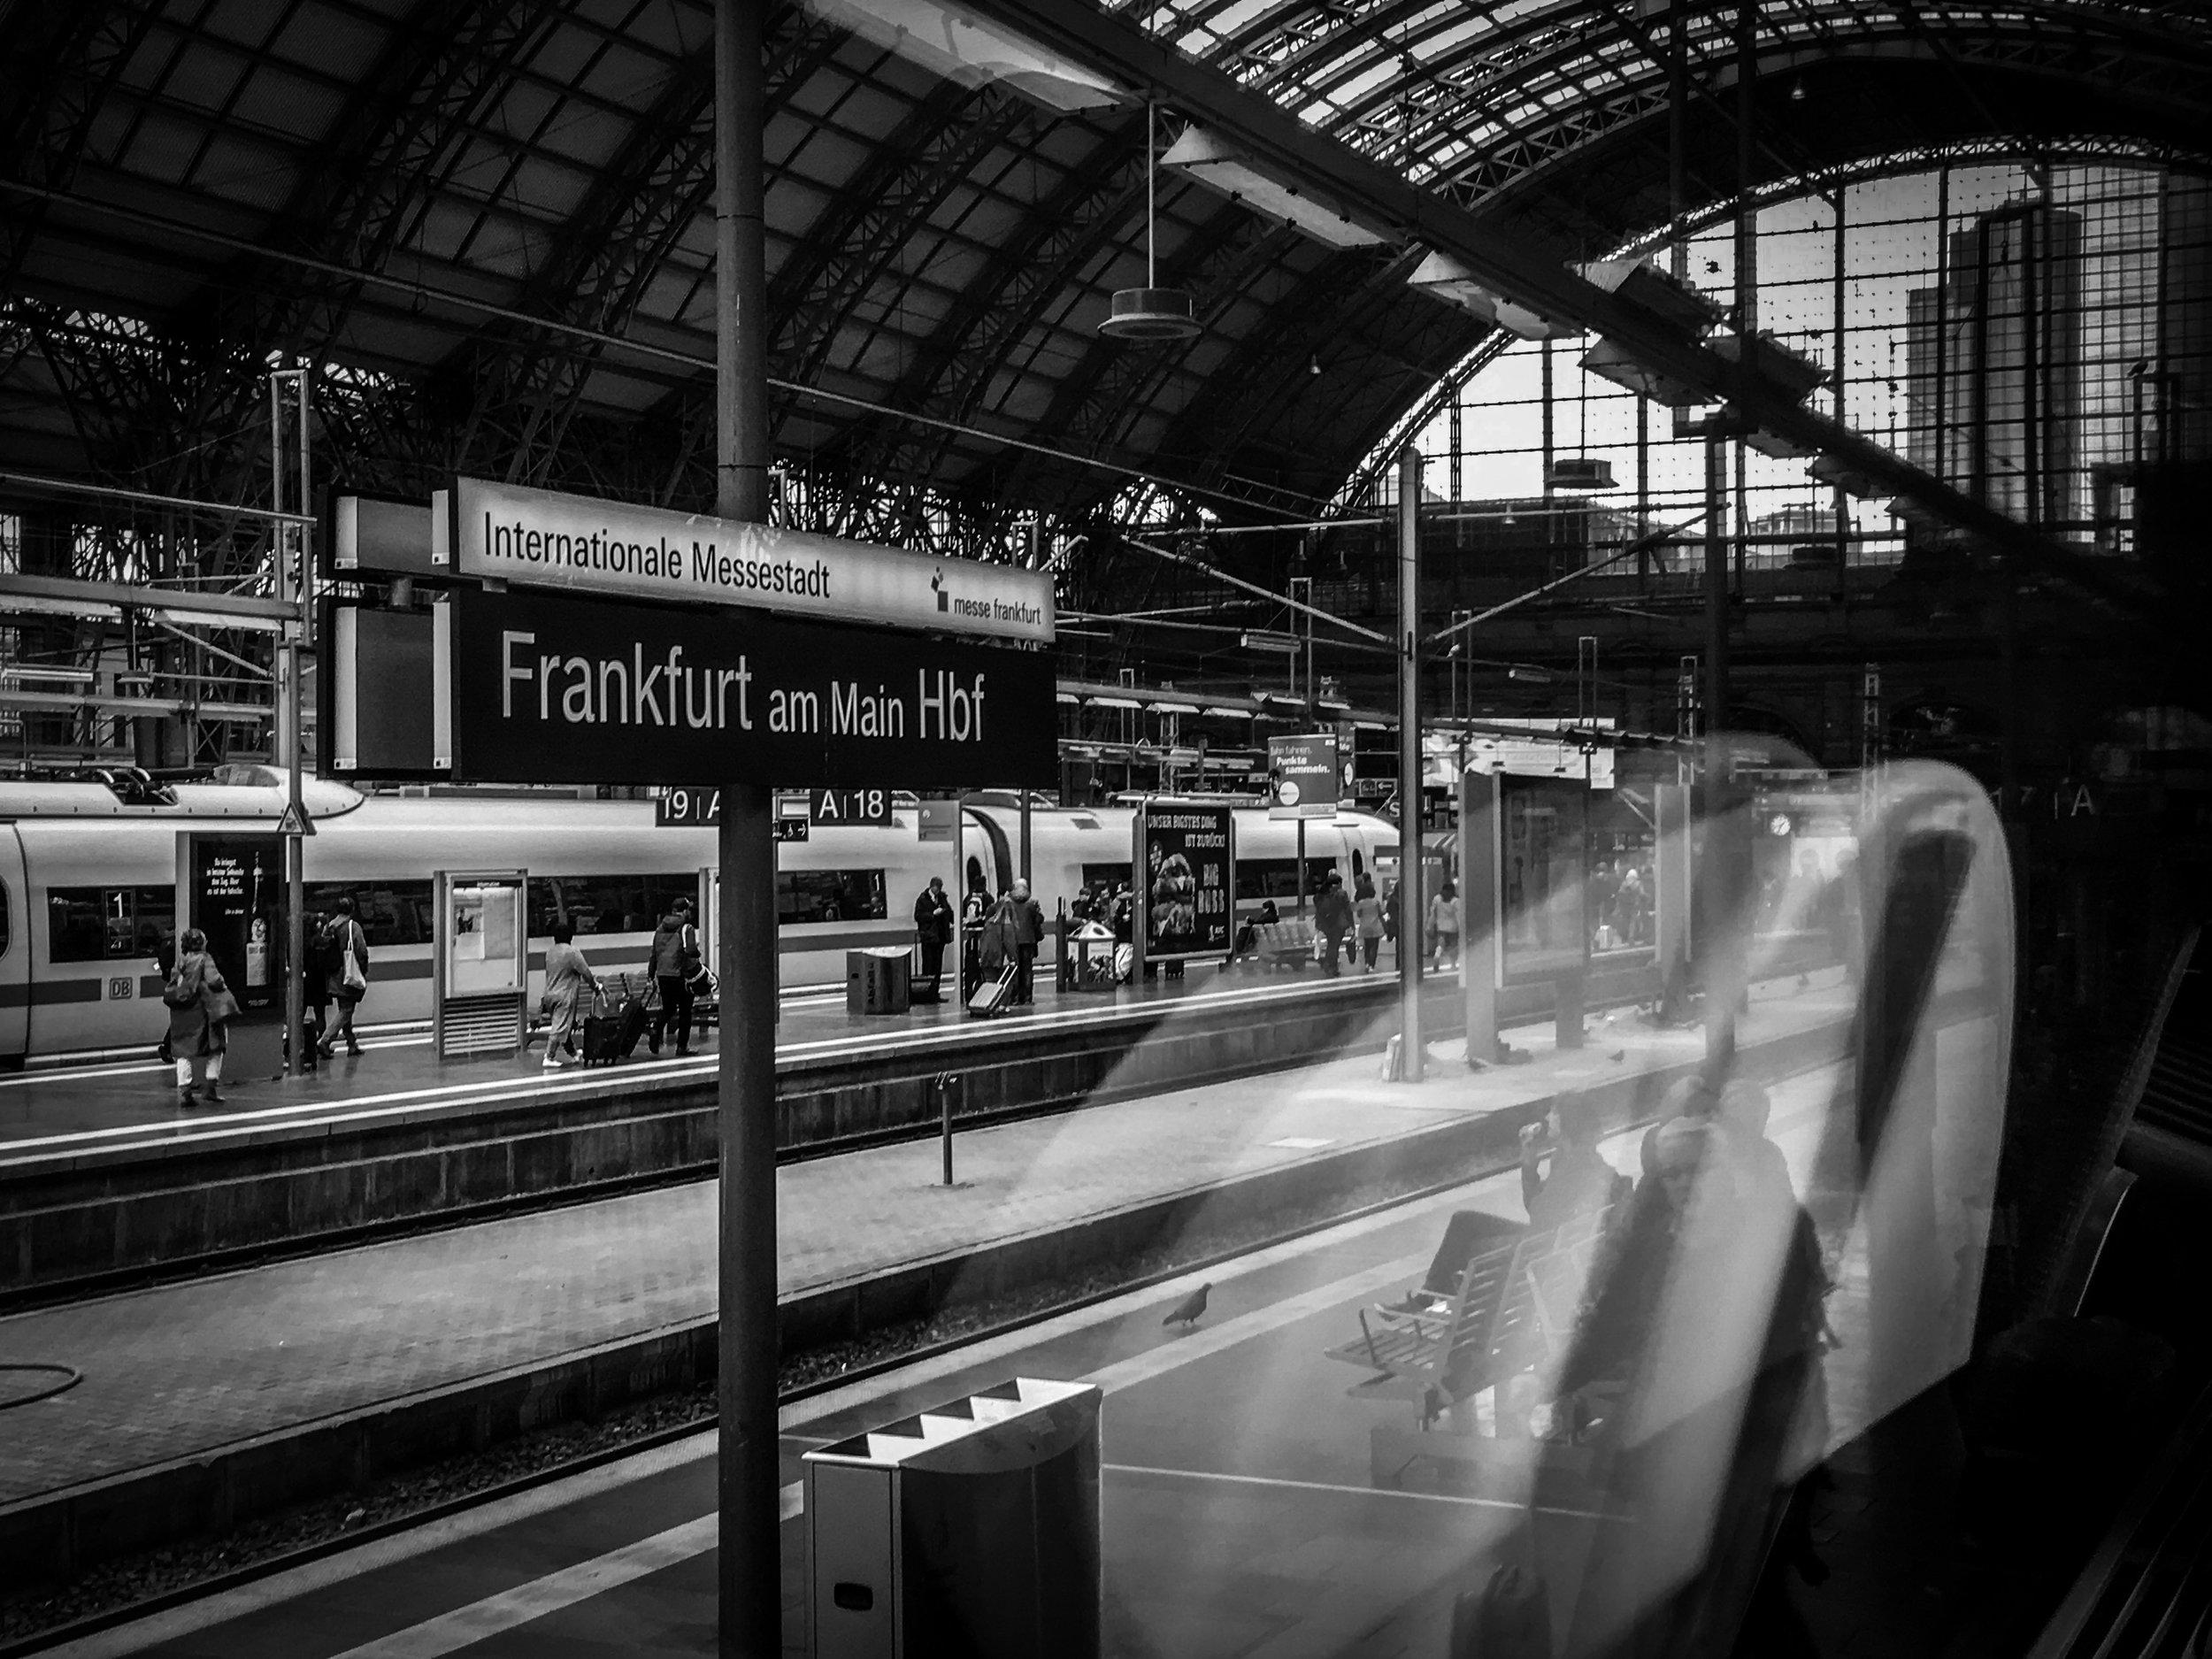 Frankfurt station